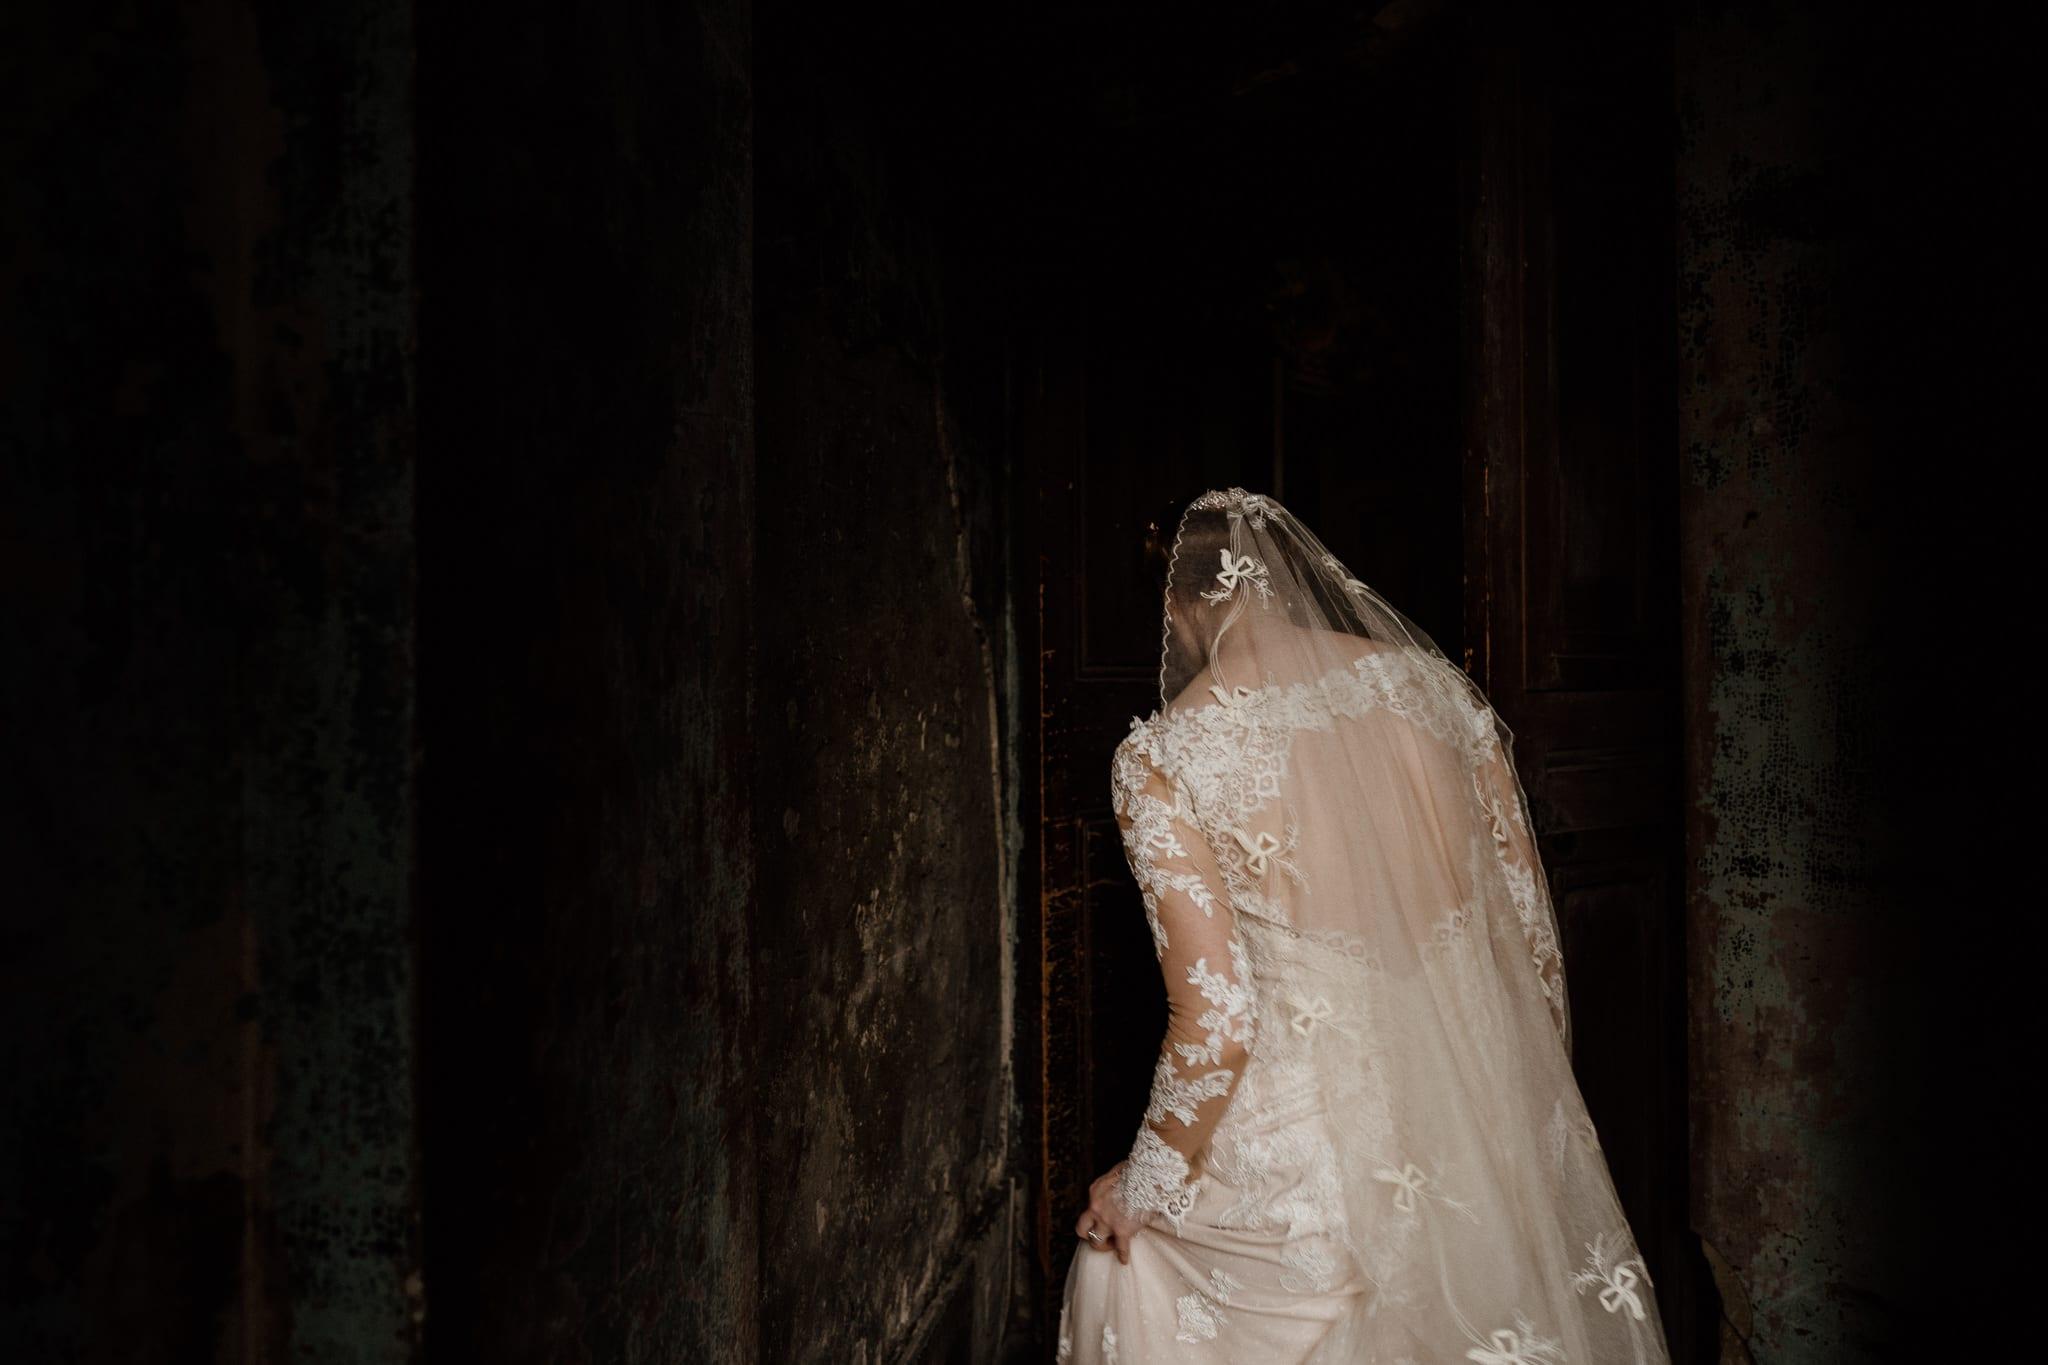 Bride in the doorway of the Asylum Chapel, London